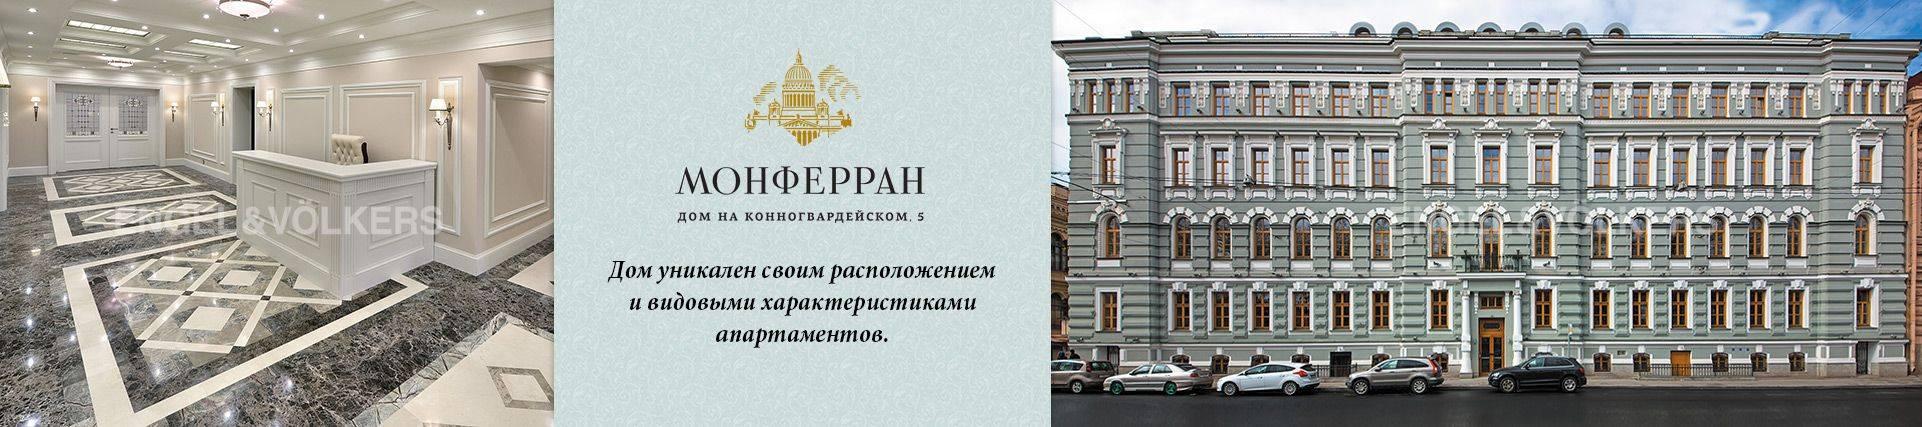 https://evspb.ru/wp-content/uploads/2018/05/nev_banners1.jpg